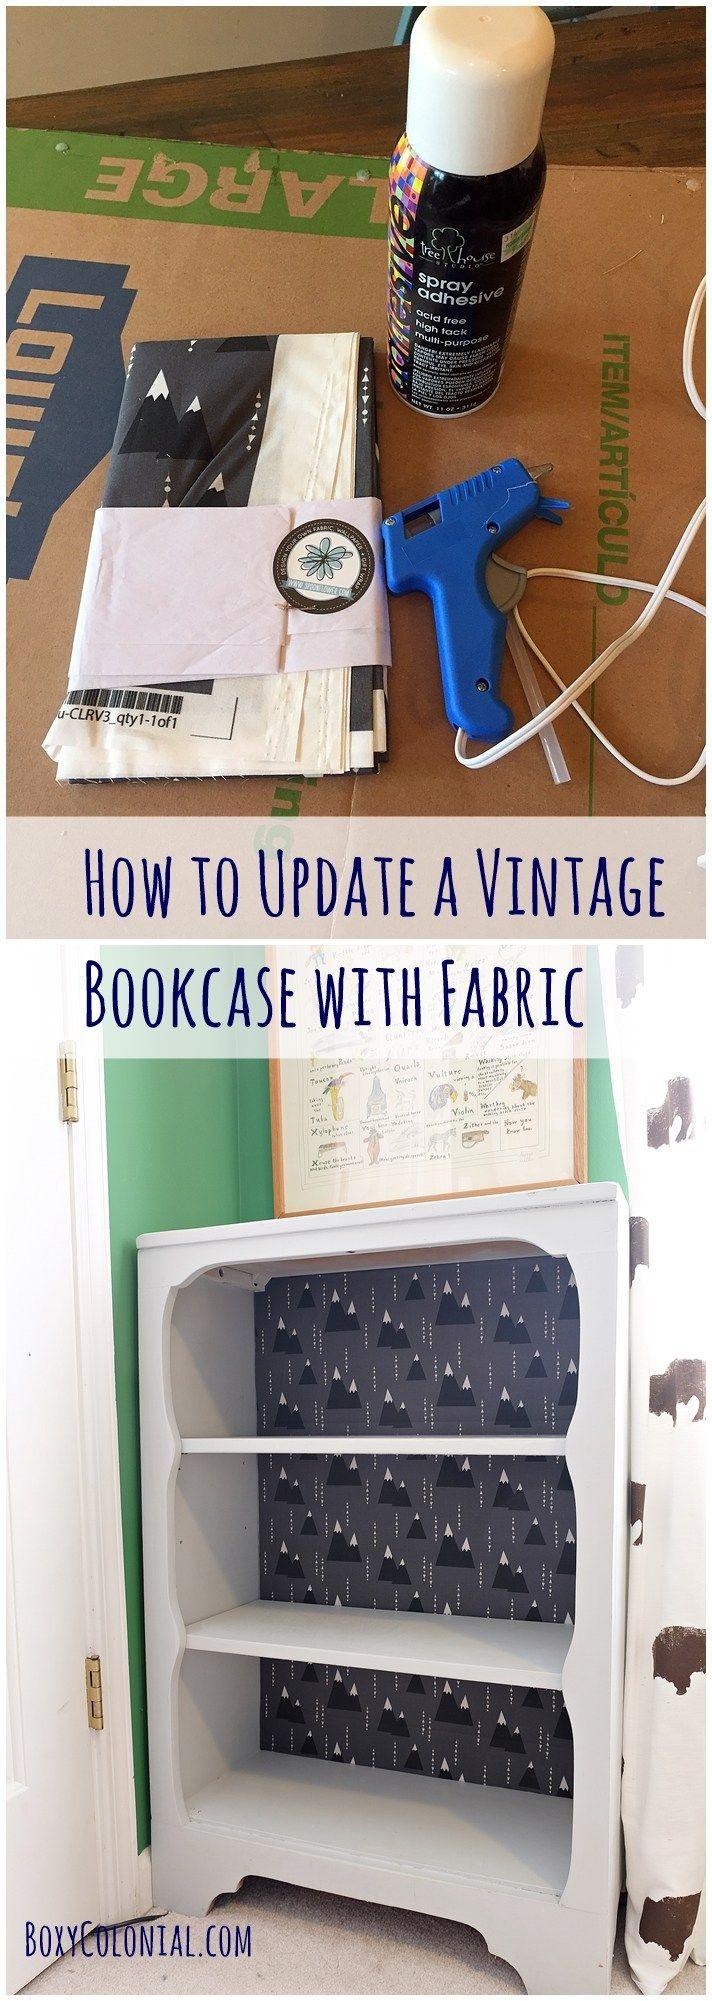 How to Make Over a Vintage Bookshelf with Fabric - #furnitureredos